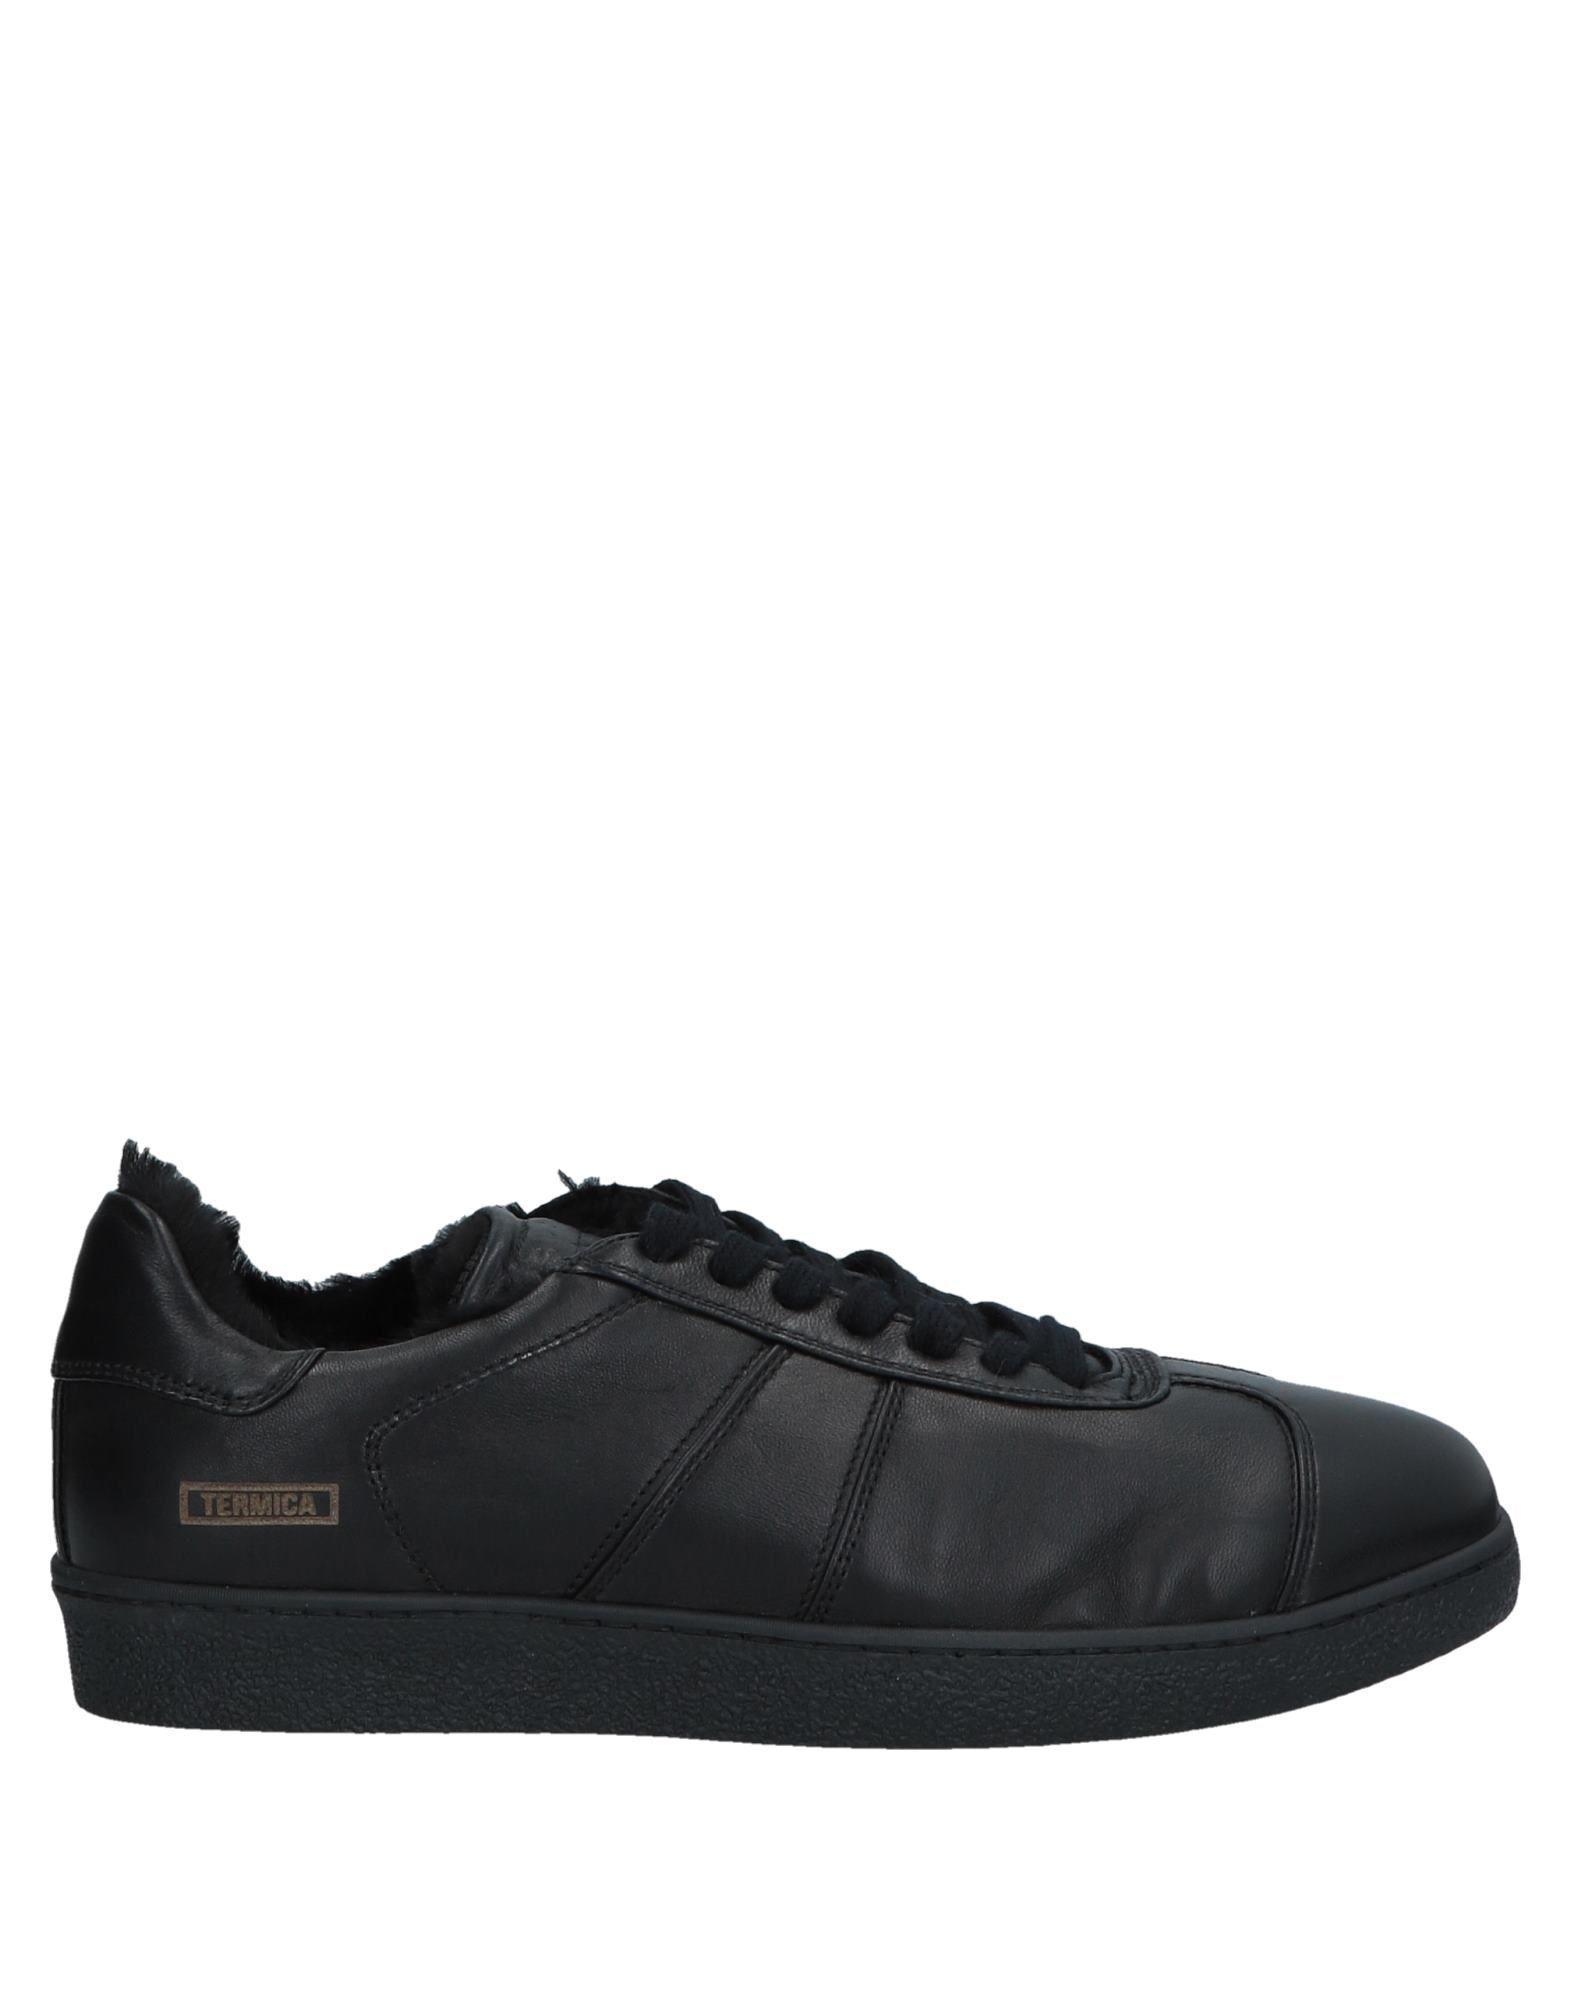 Pantofola D'oro Sneakers Herren  11569753CQ Gute Qualität beliebte Schuhe